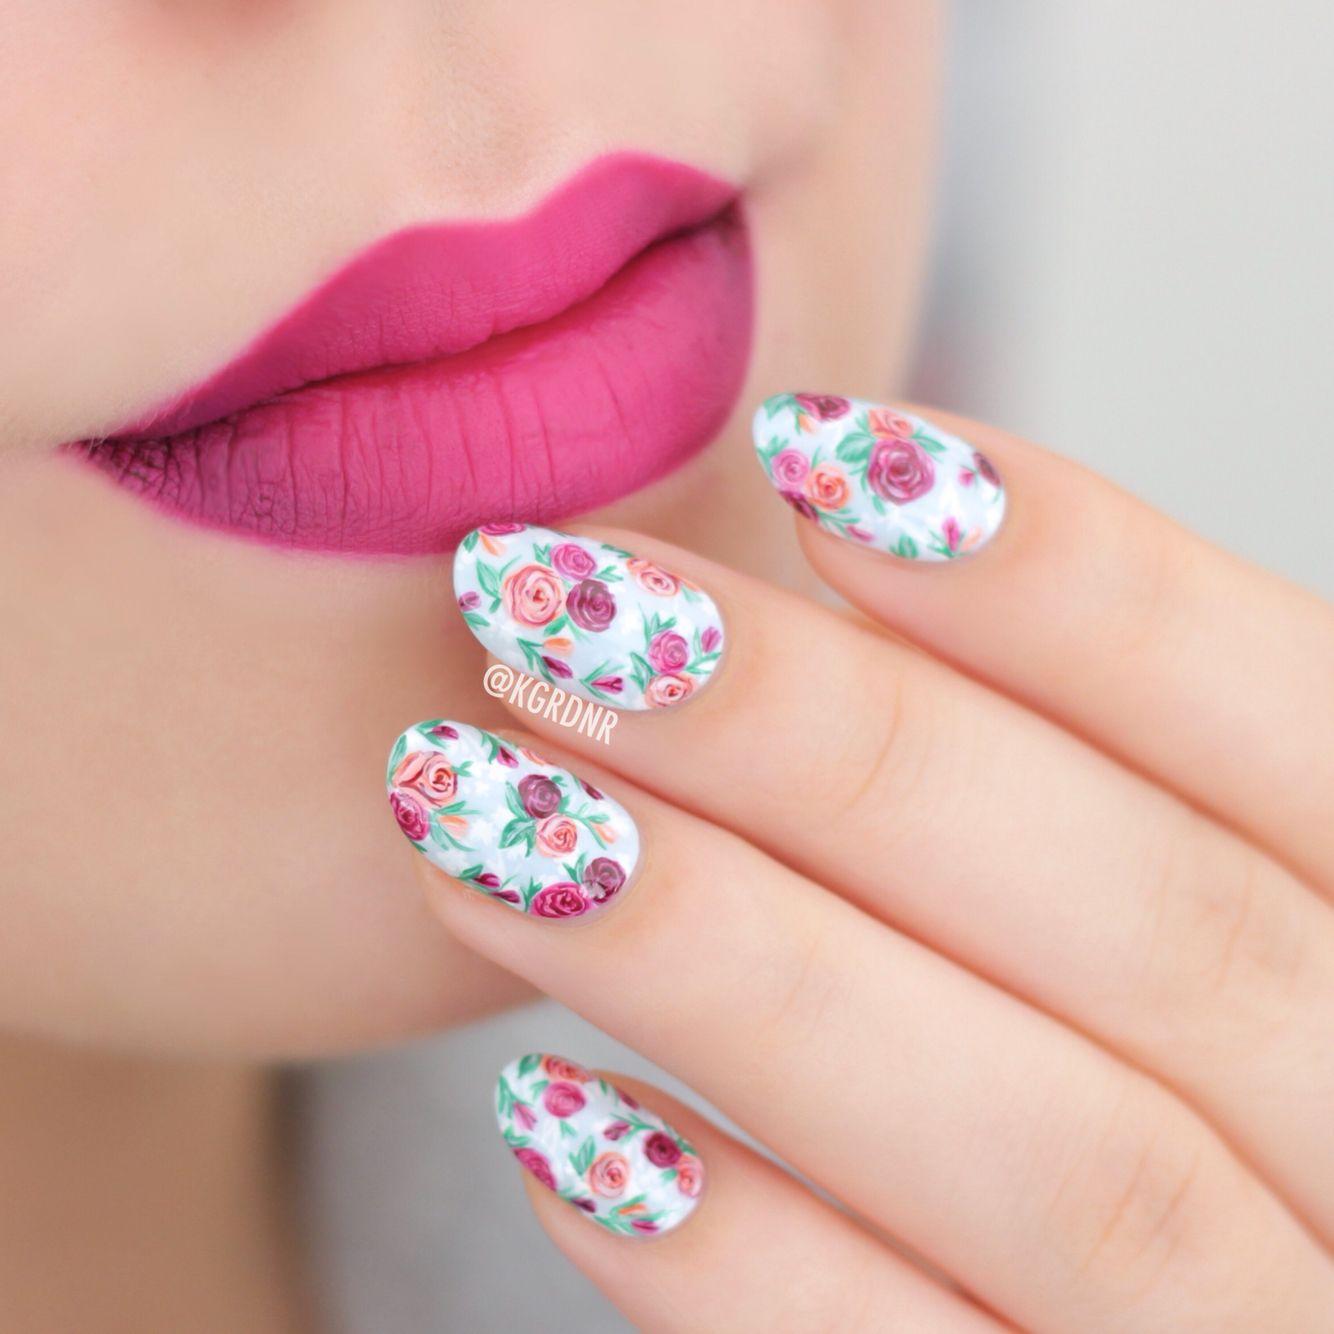 Ombré lips & hand painted floral nails for #WNAC2015 with Essie Find Me An Oasis   Lacquerstyle.com   kgrdnr   #lacquerstyle #kgrdnr #nailart #nailartist #artist #art #handpainted #freehand #nails #essie #ombre #ombrelips #katvond #bauhau5 #backstagebambi #vampira #liquidlipstick #lipstick #gradient #gradientlips #lips #makeup #nailpolish #floralnails #flowers #rosenails #roses #florals #love #beautiful